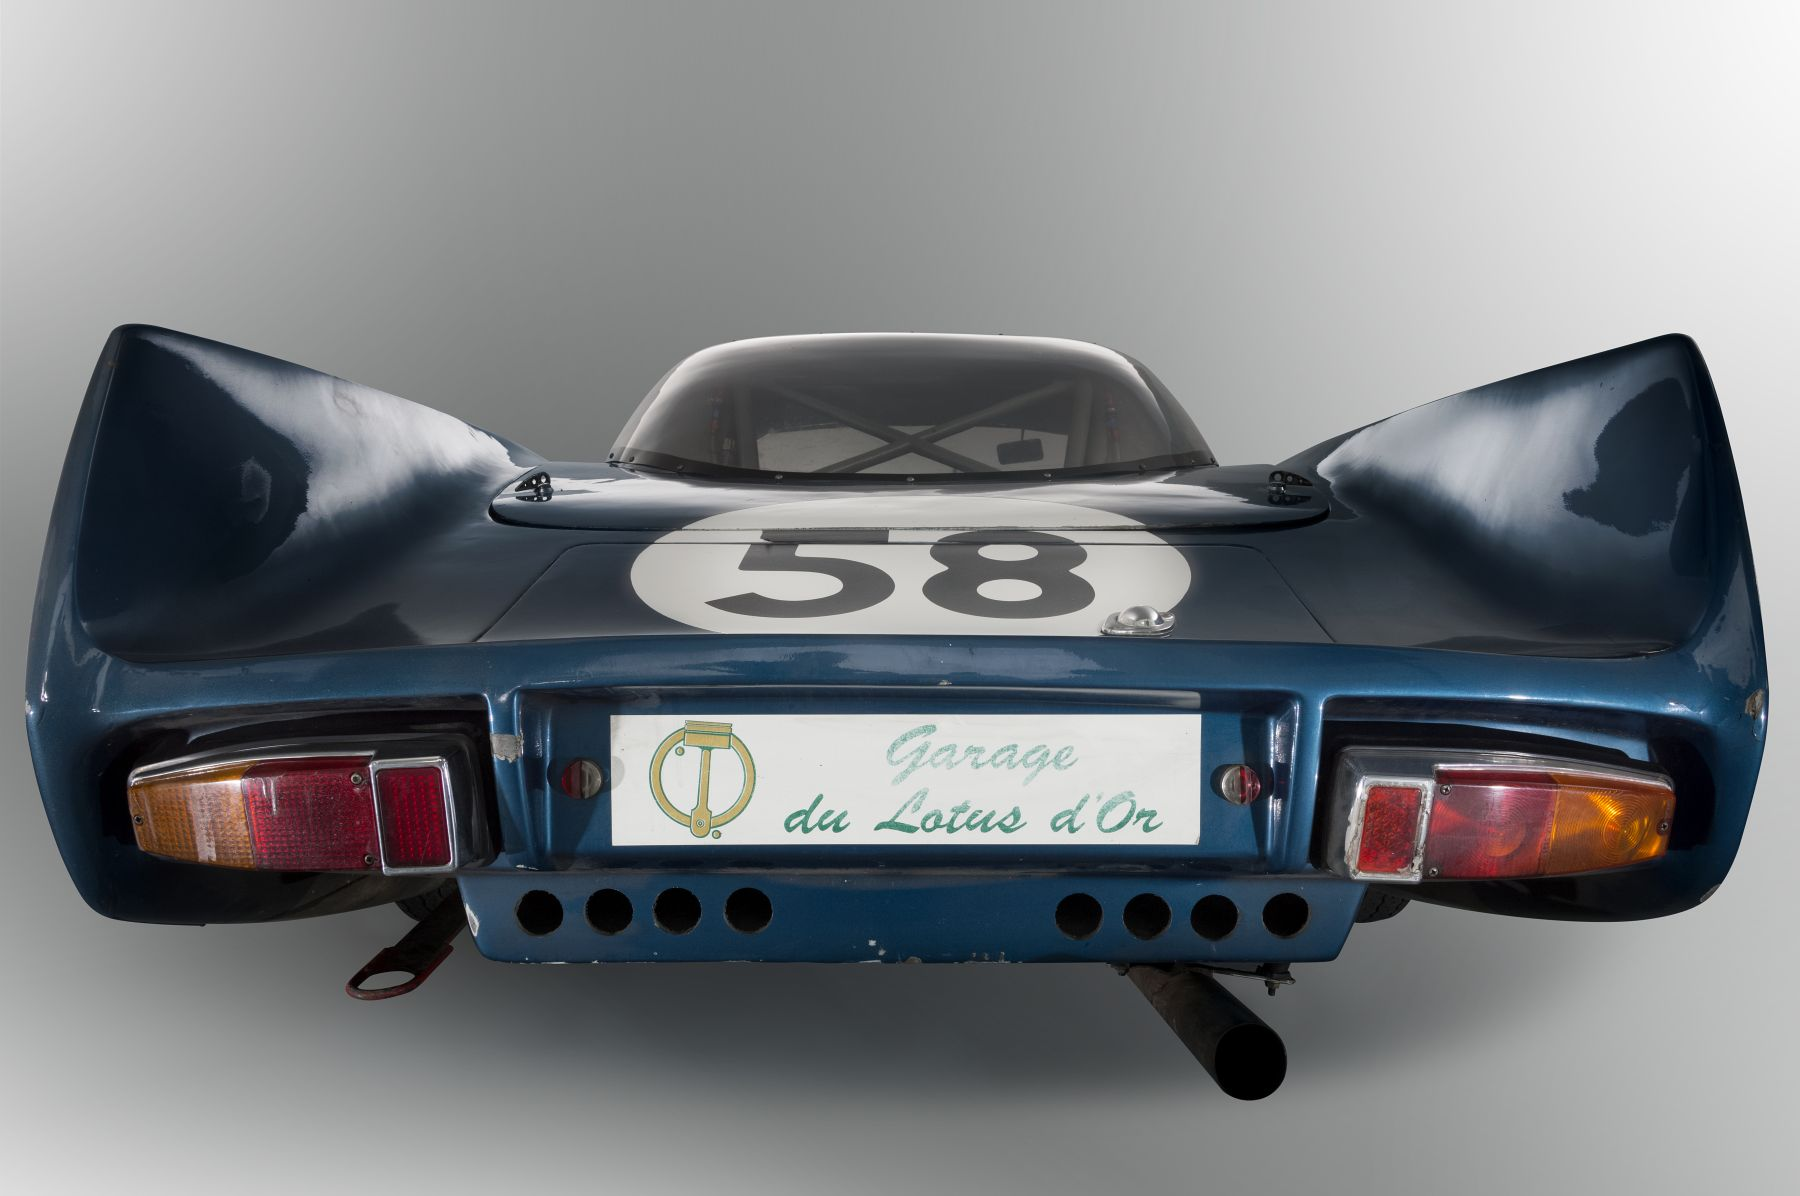 Alpine A210 Le Mans 1966 classicdriver com 20_13